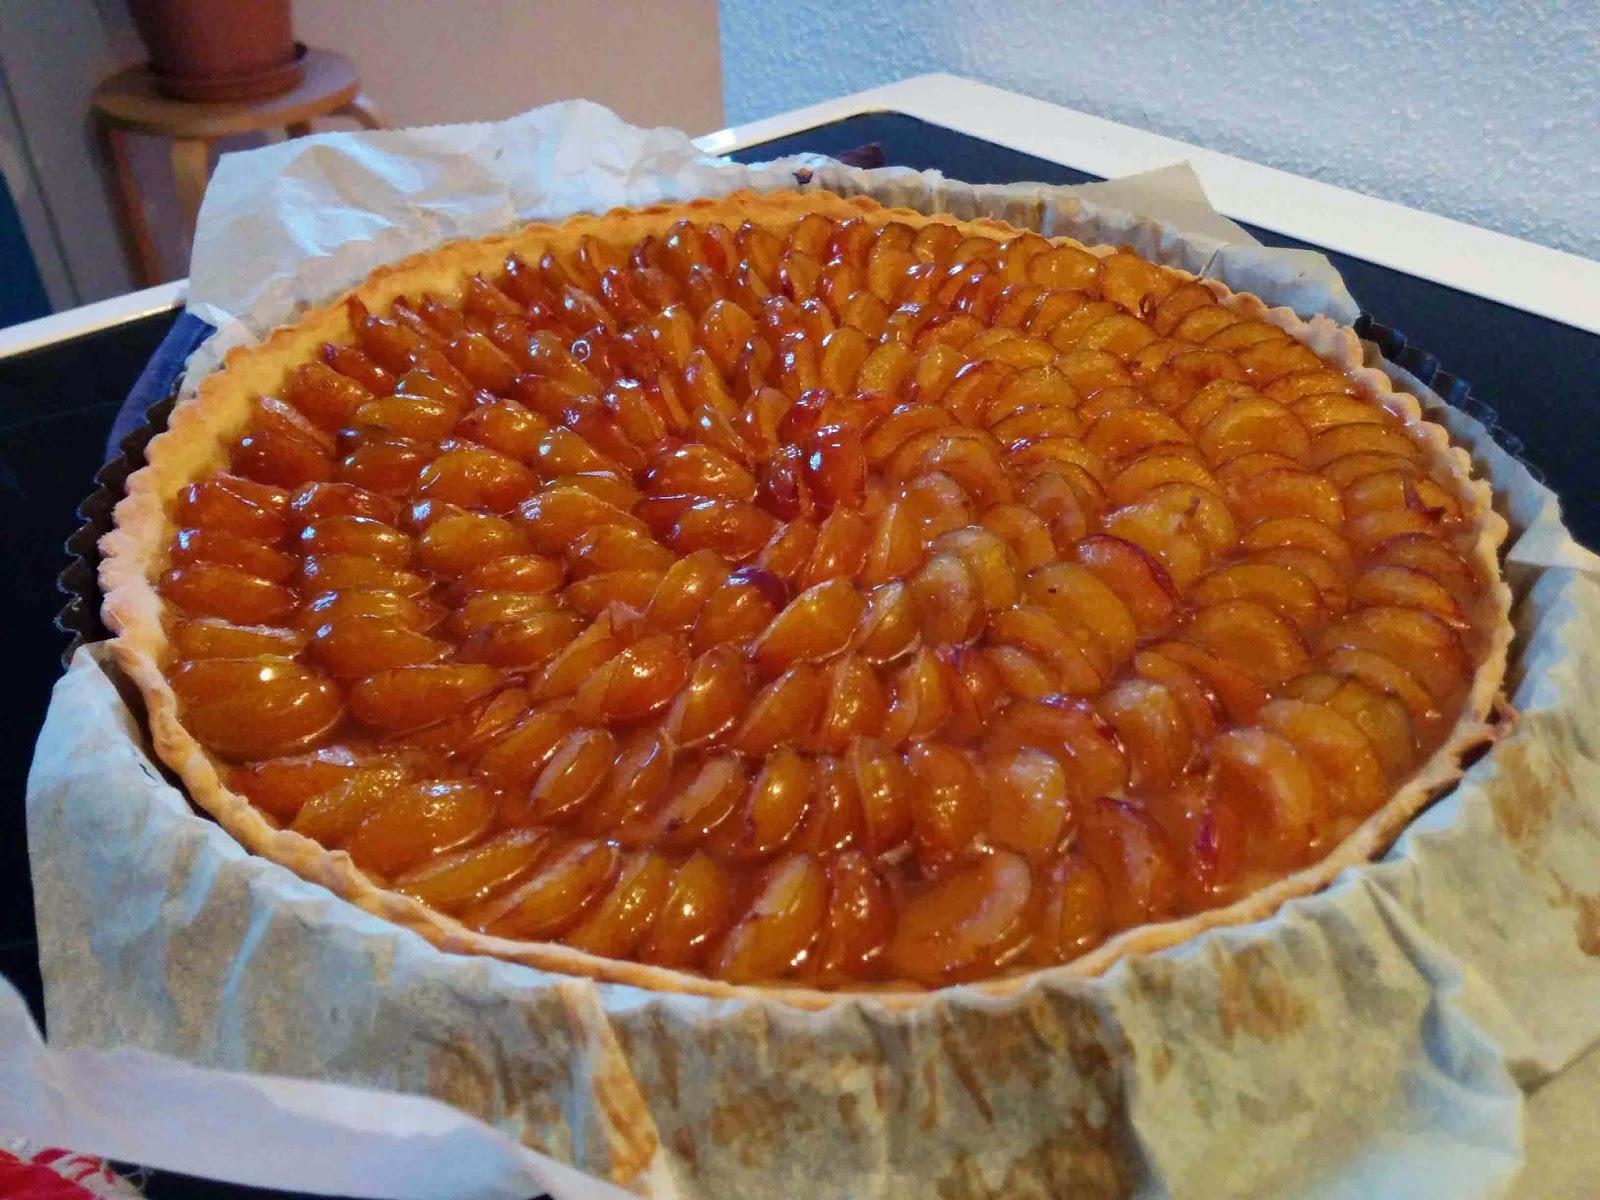 http://camilleenchocolat.blogspot.fr/2014/09/tarte-aux-mirabelles-et-variante-au.html